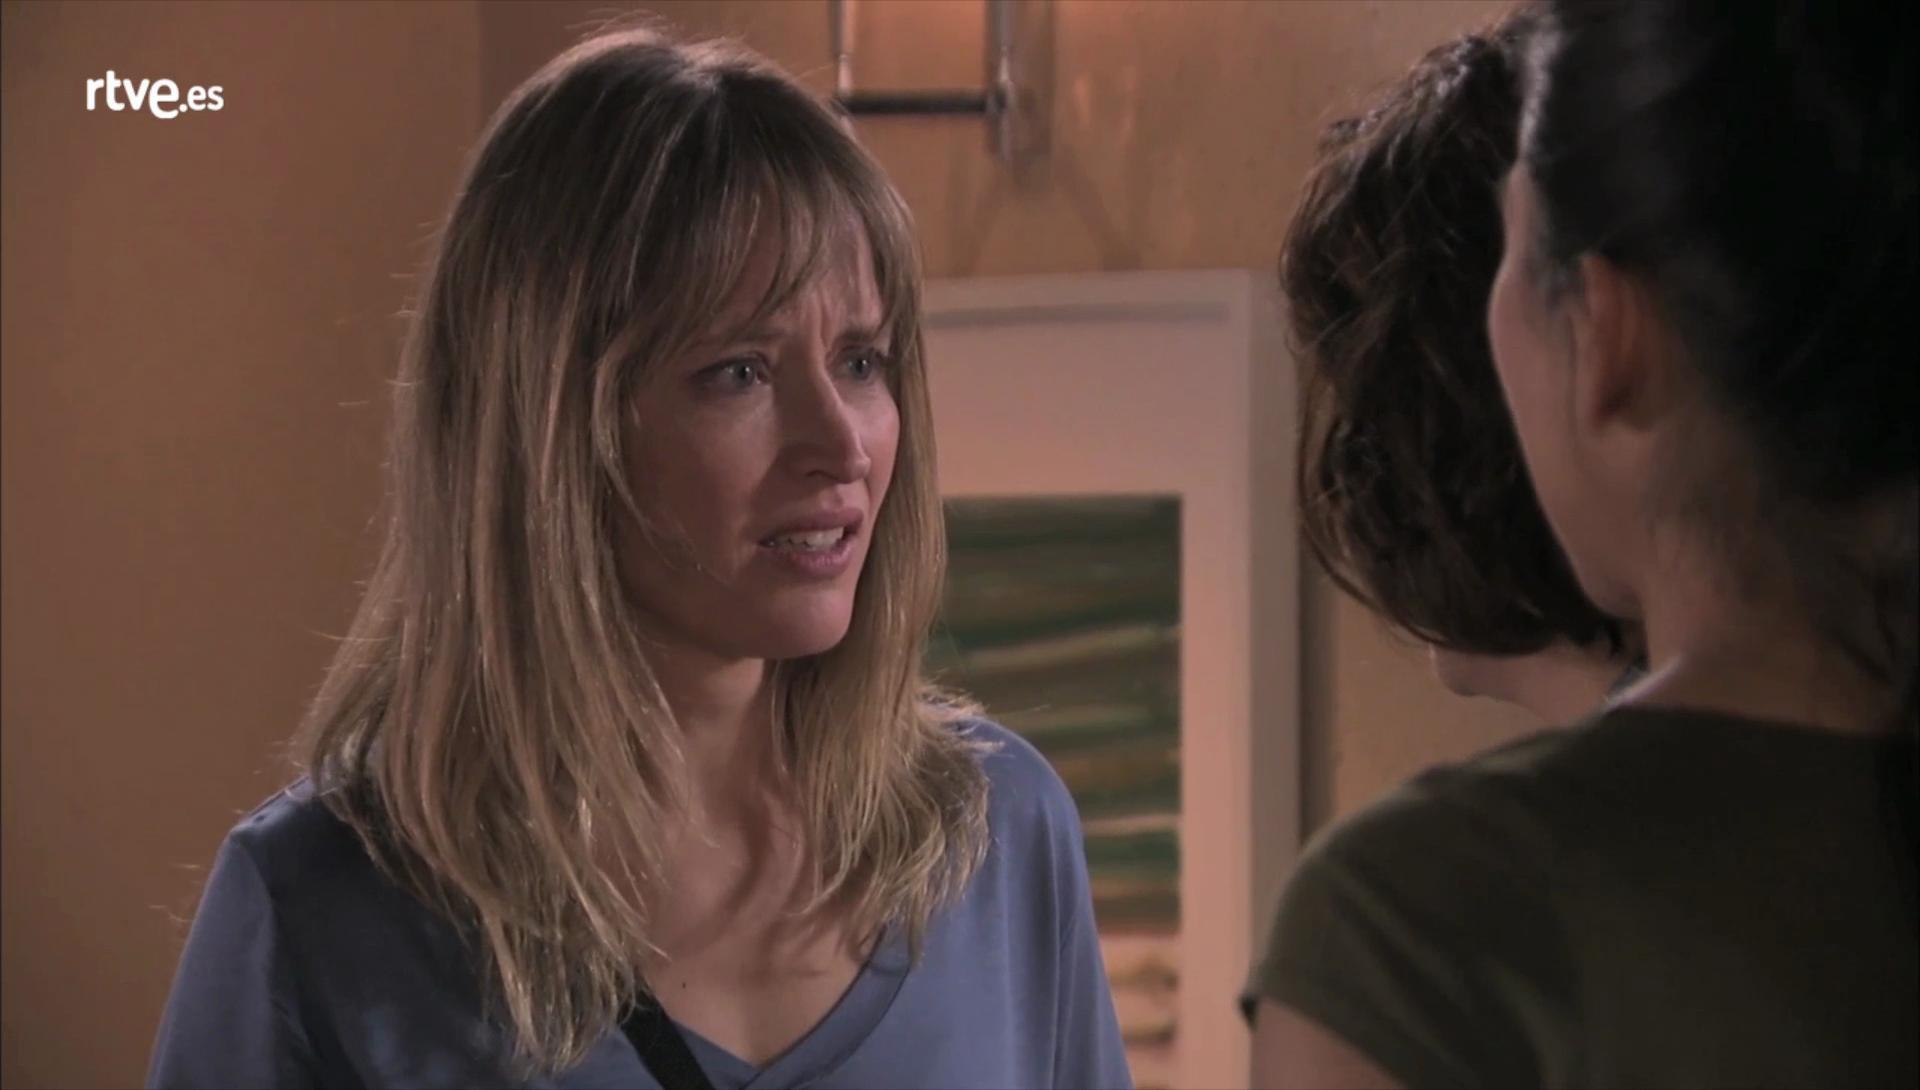 Nora descubre a Teresa y Nacha reconciliándose